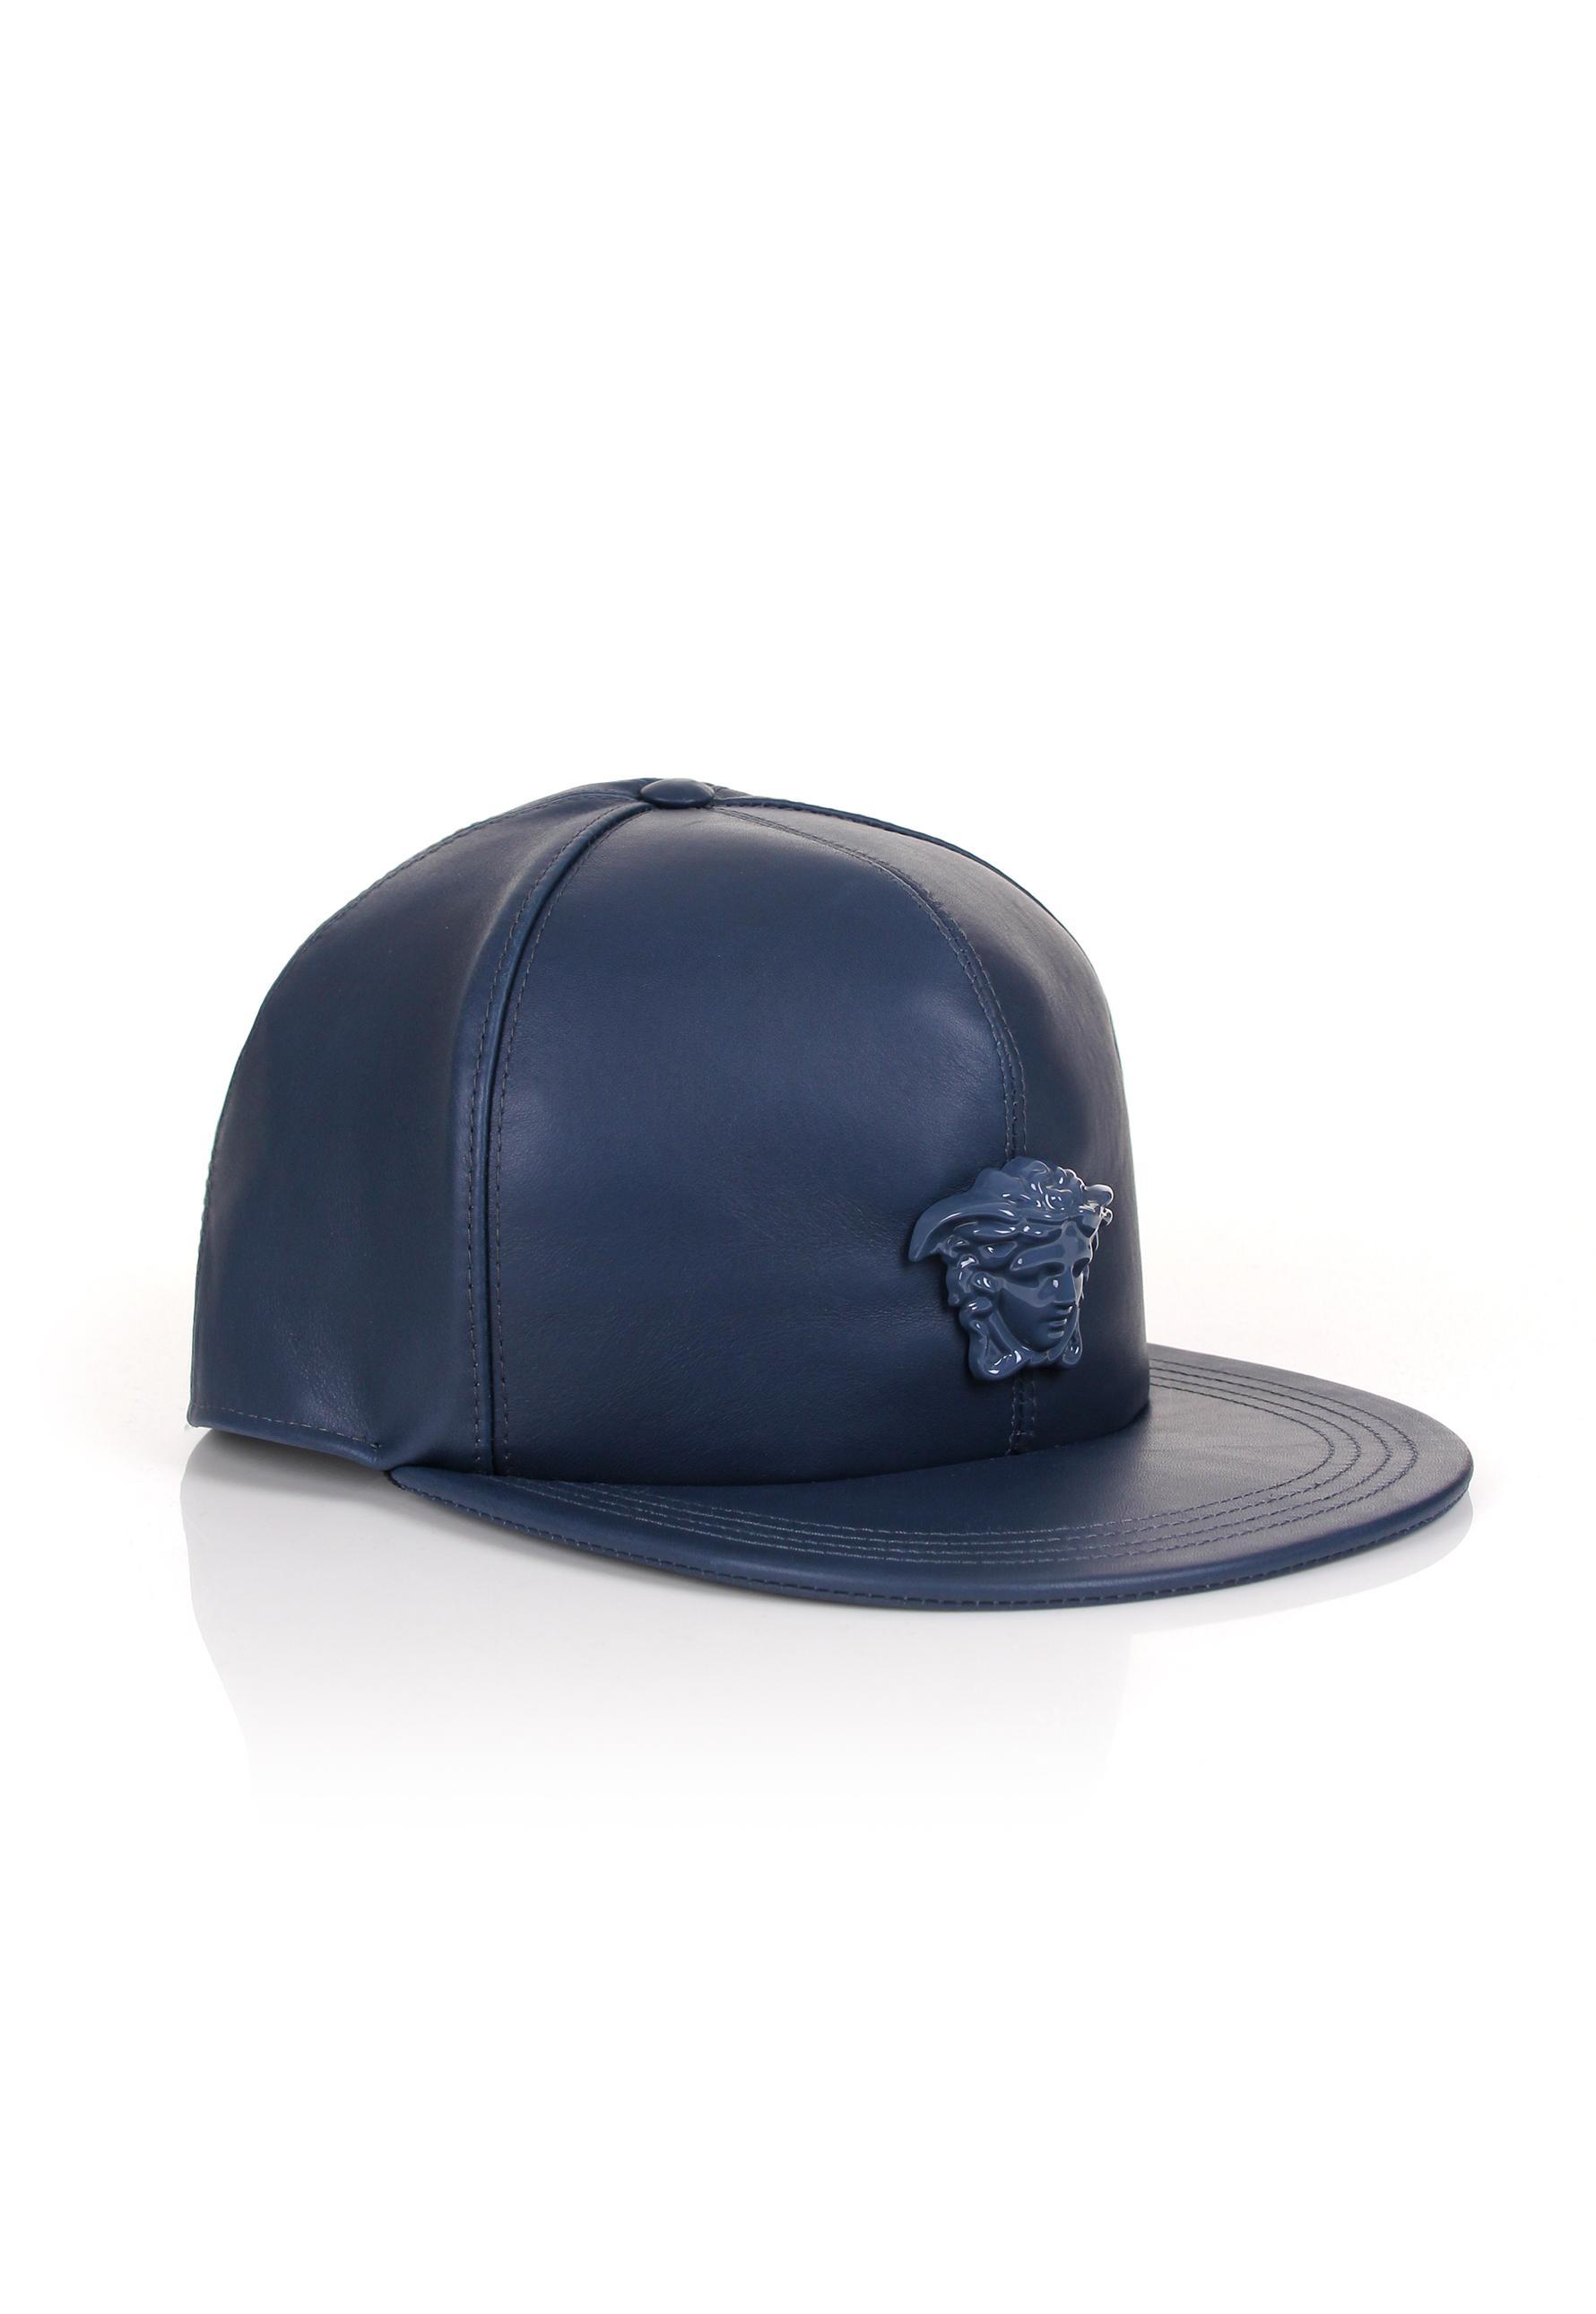 Lyst - Versace Medusa Logo Leather Show Cap Navy navy in Blue for Men 6c36bee520d